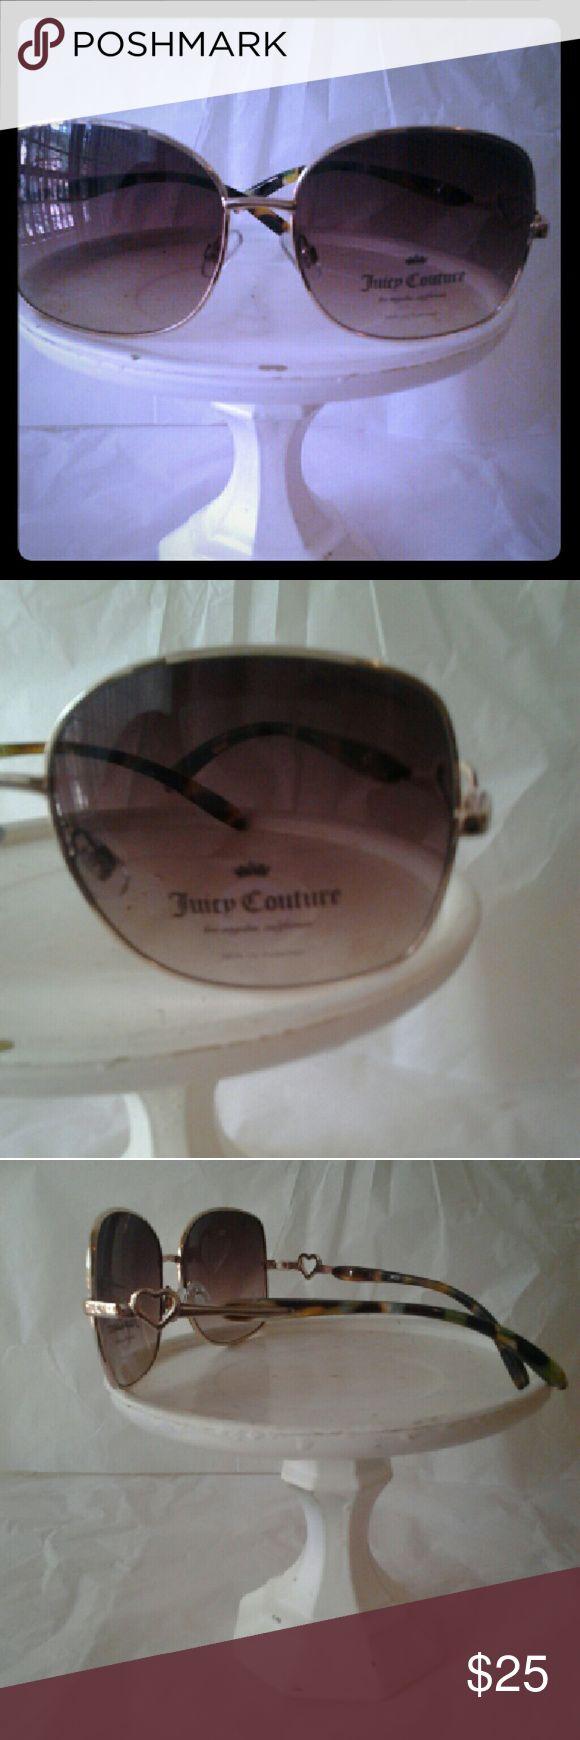 New Juicy Couture  women's  aviator sunglasses New Juicy Couture sunglasses with tag 100% uv protection Juicy Couture Accessories Sunglasses